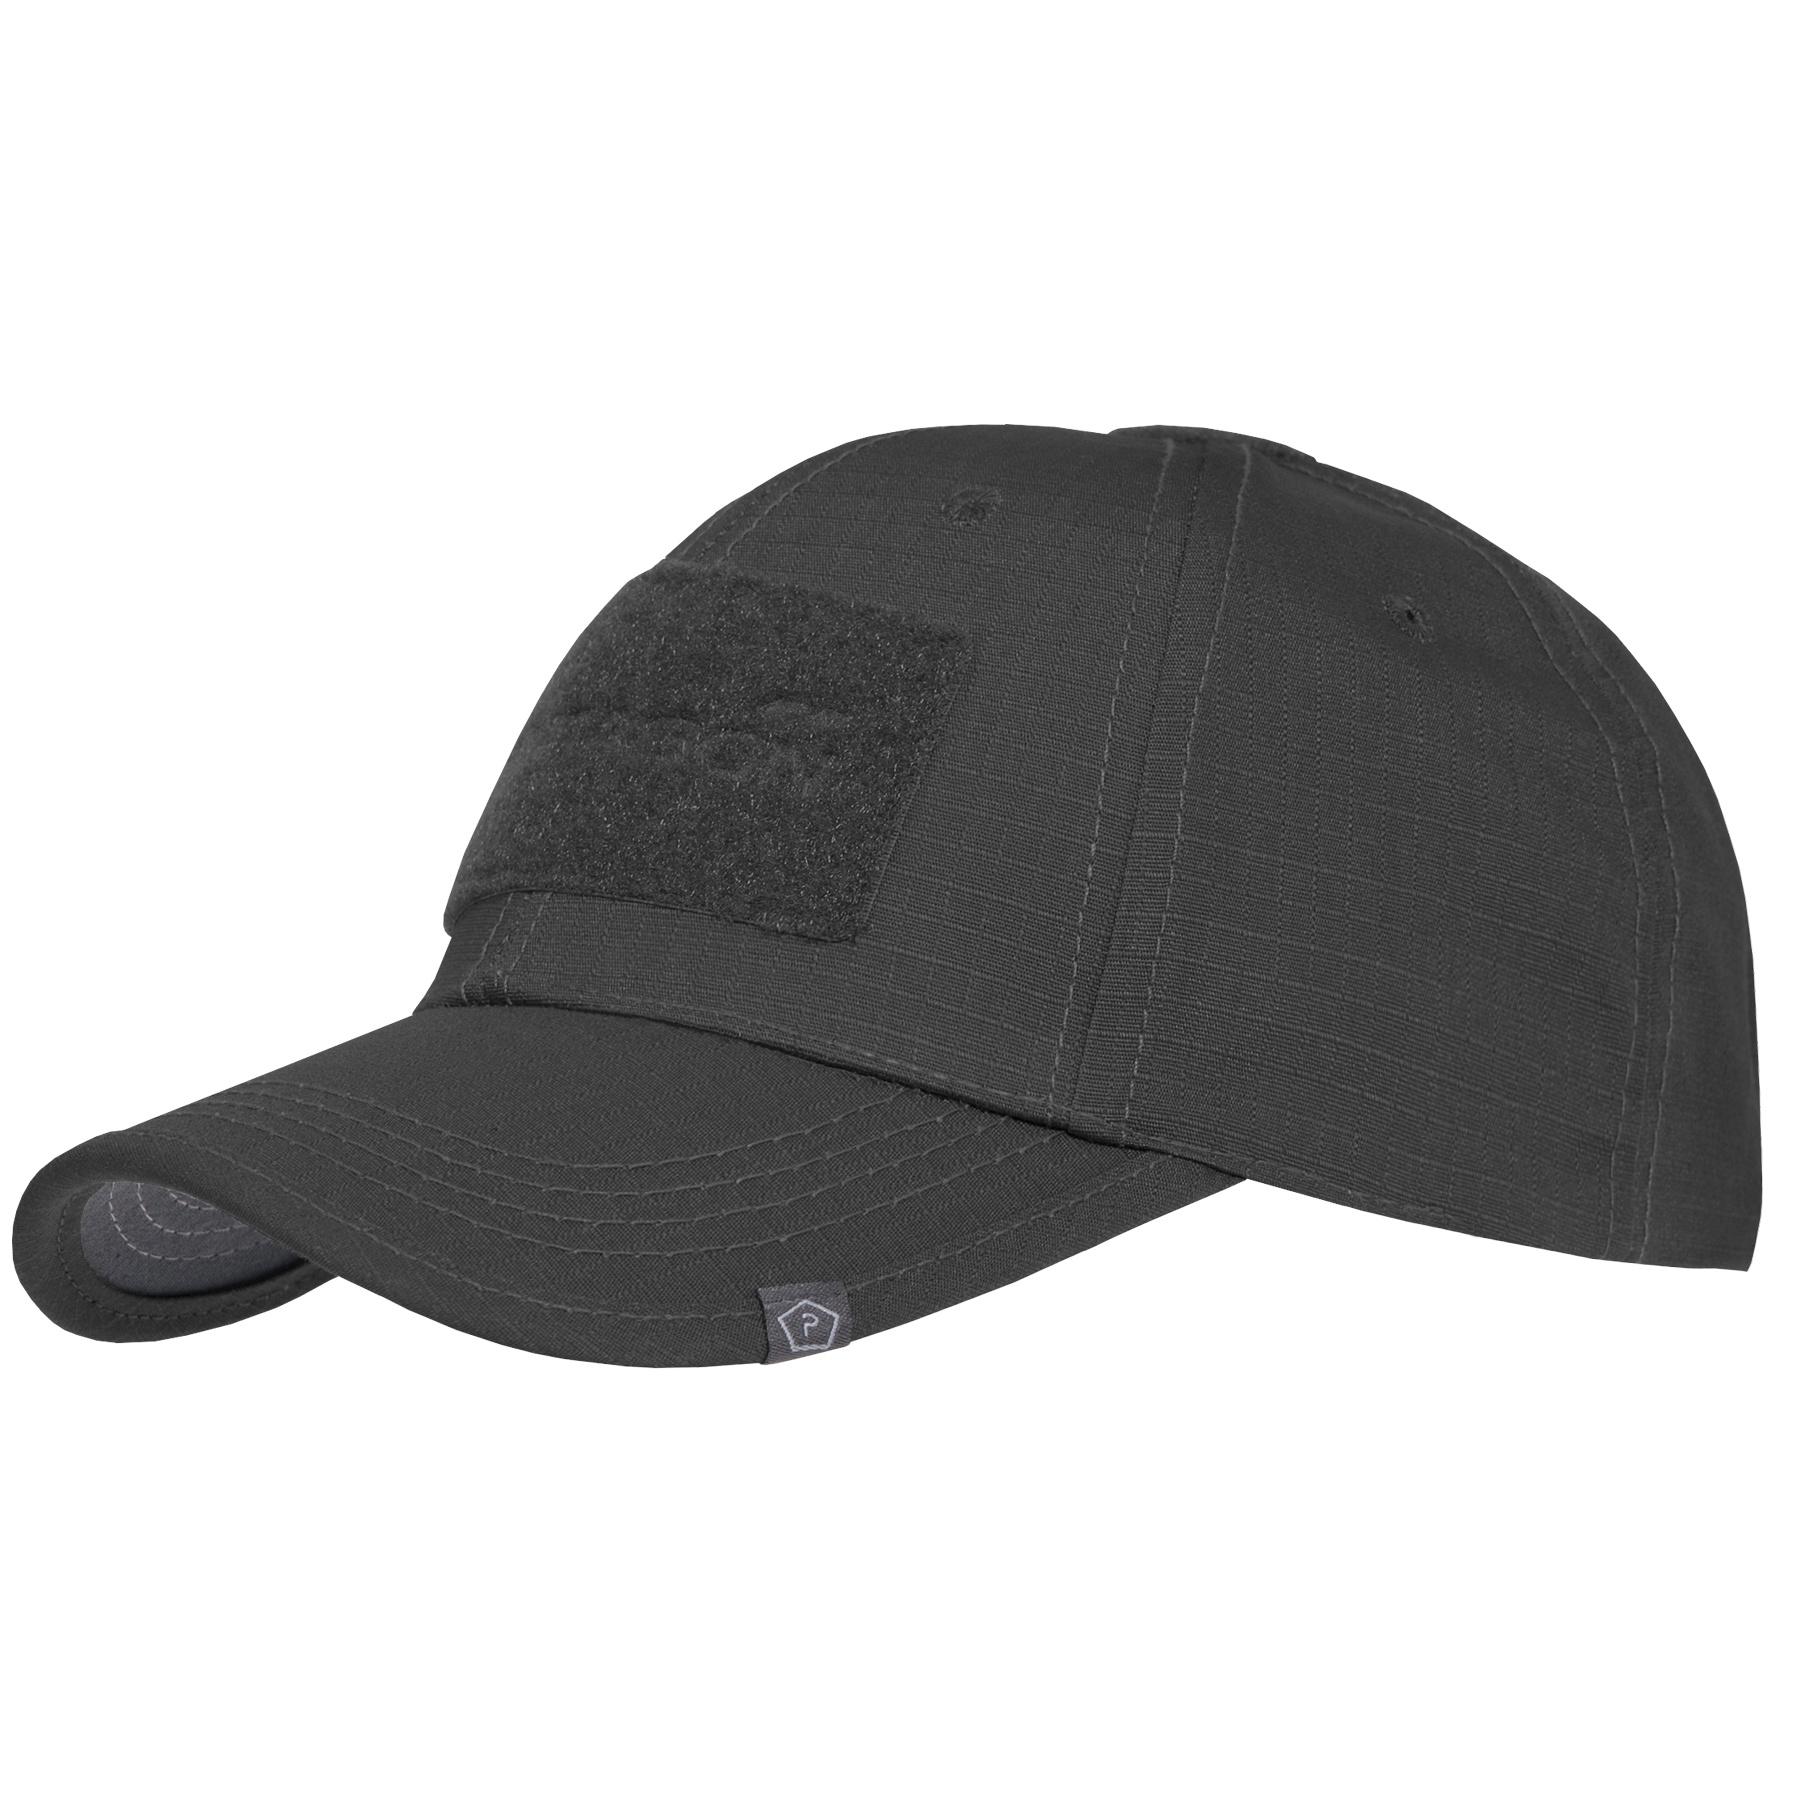 Pentagon Tactical Baseball Cap